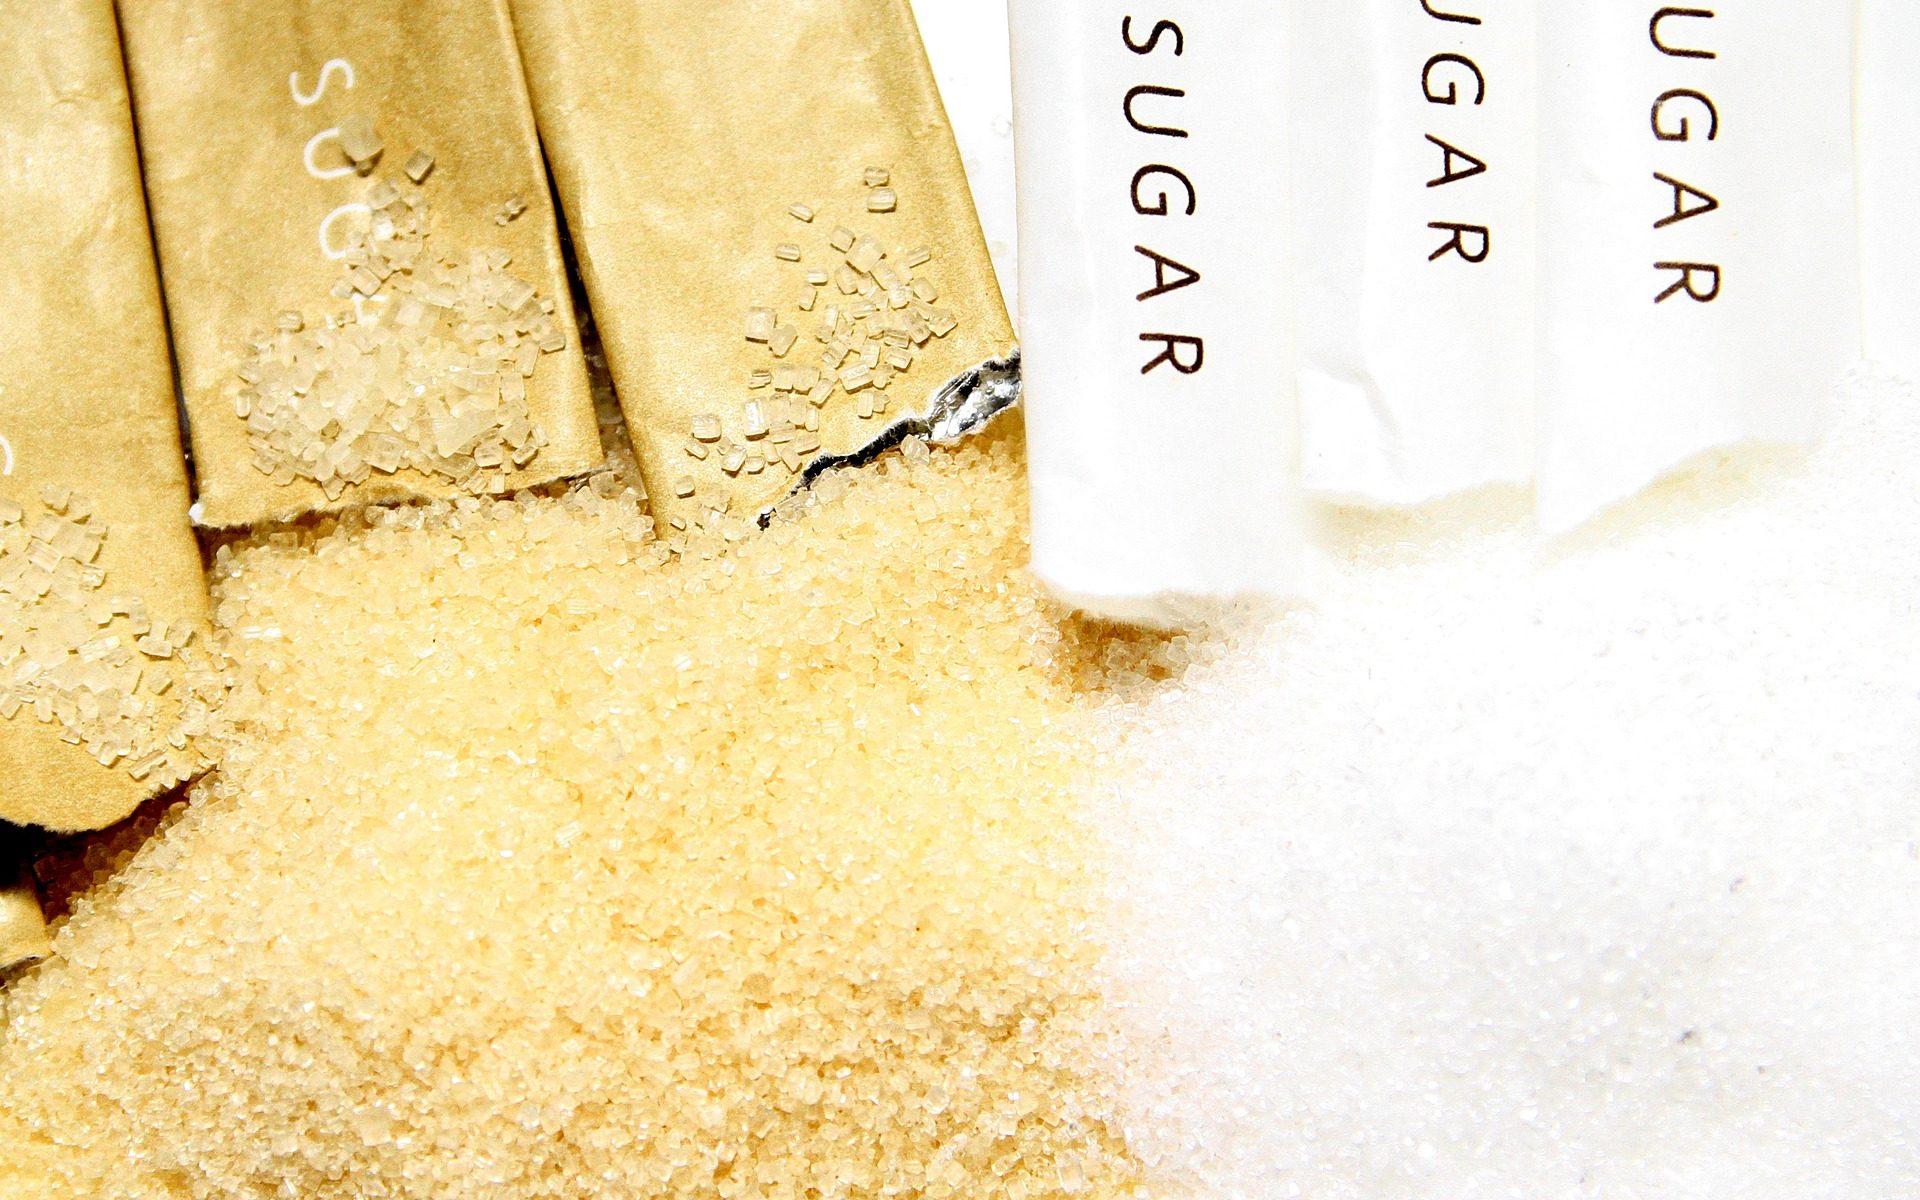 zucchero raffinato o zucchero di canna